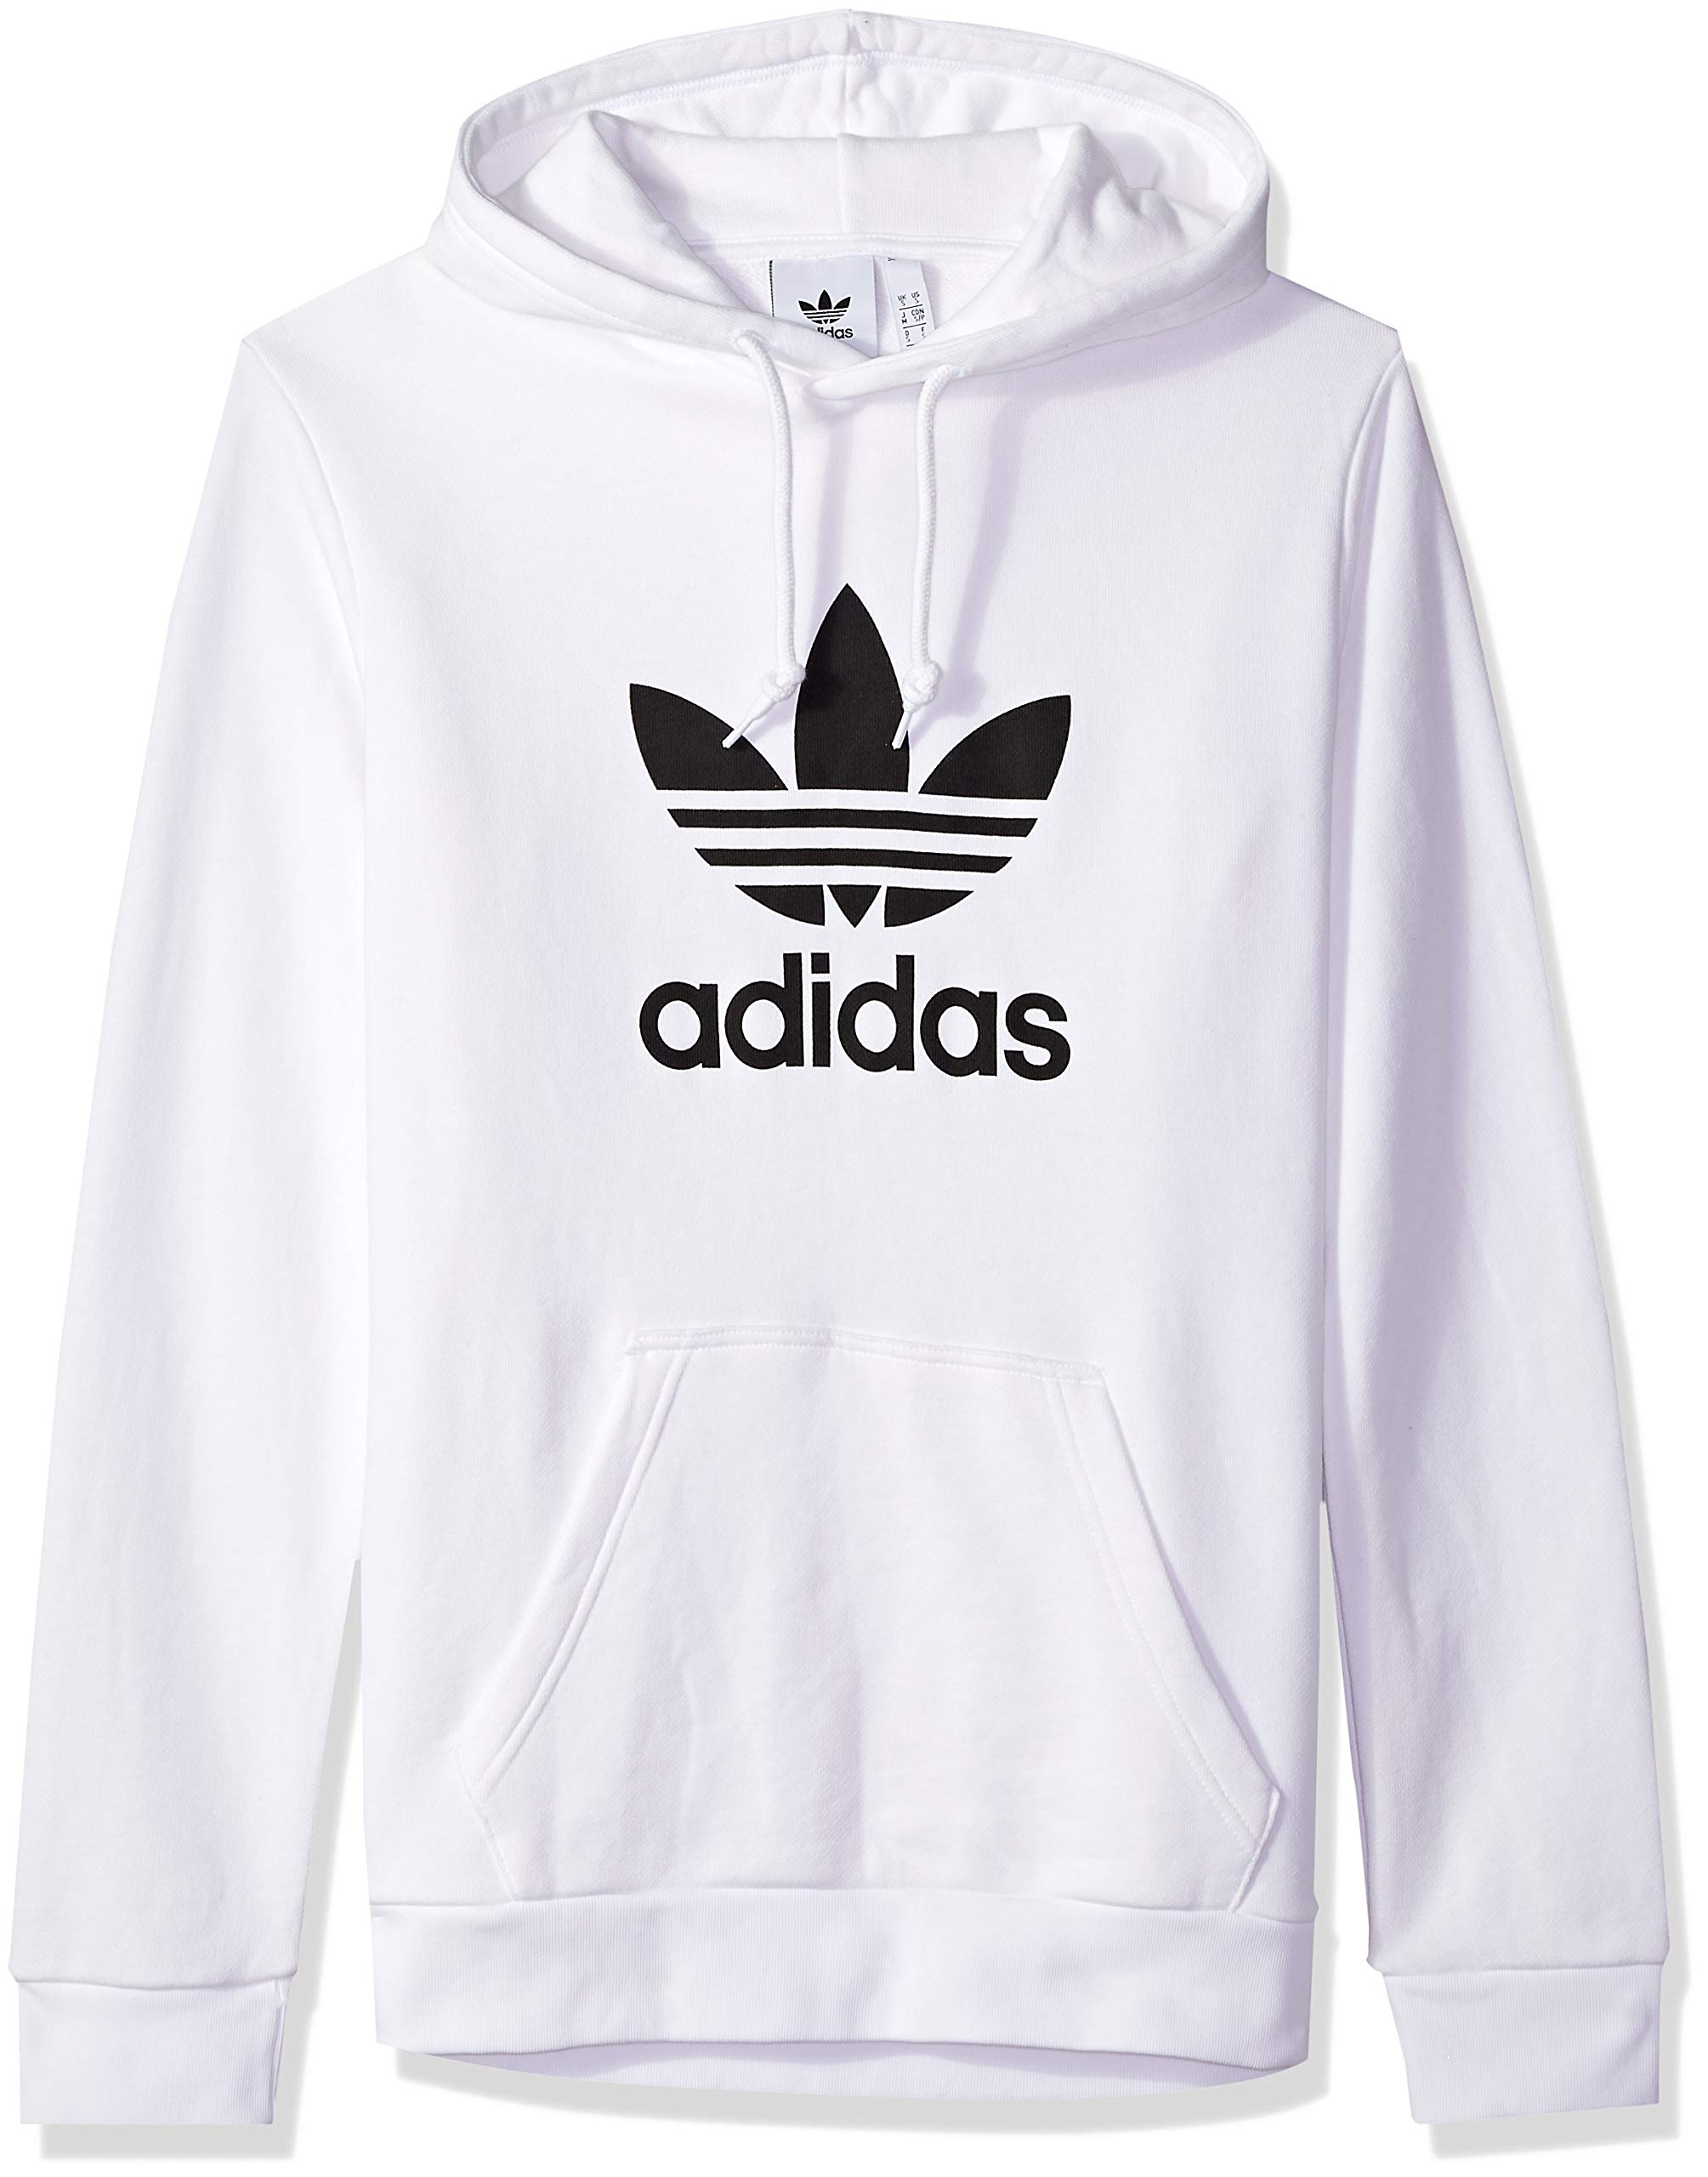 adidas Originals Men's Trefoil Hoodie, White X-Small